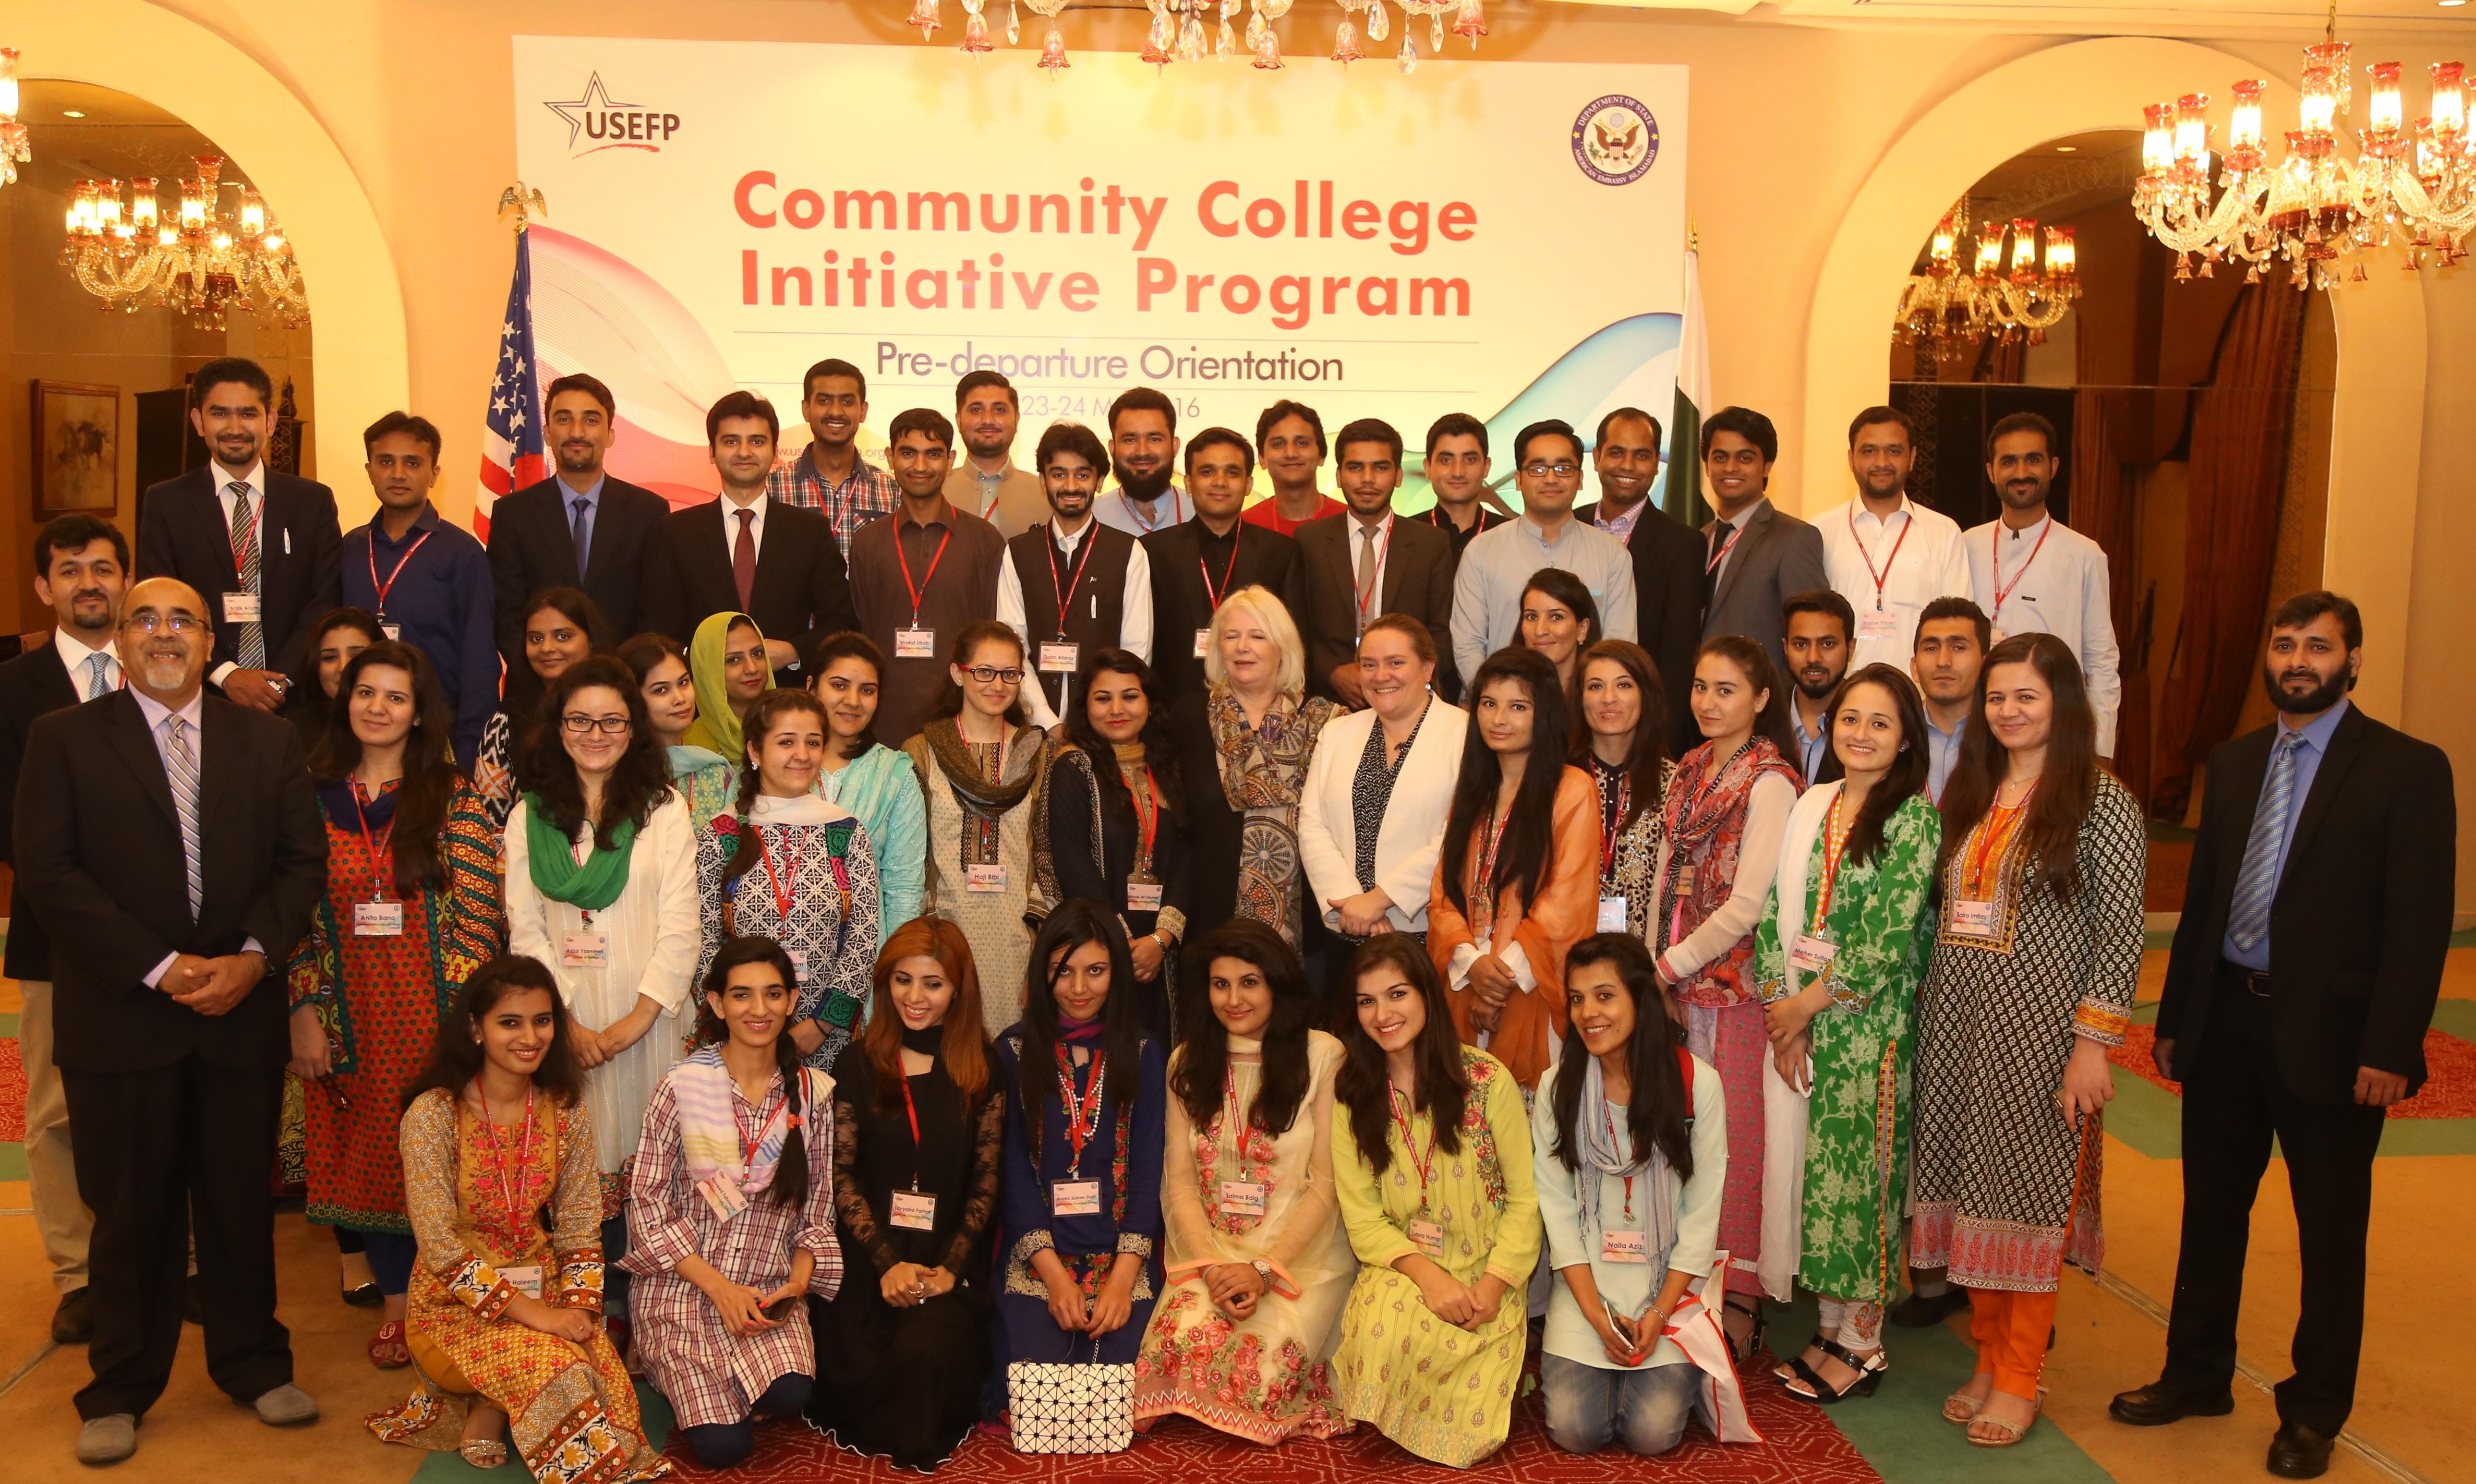 USEFP Executive Director, Rita Akhtar, with CCIP 2016 participants.